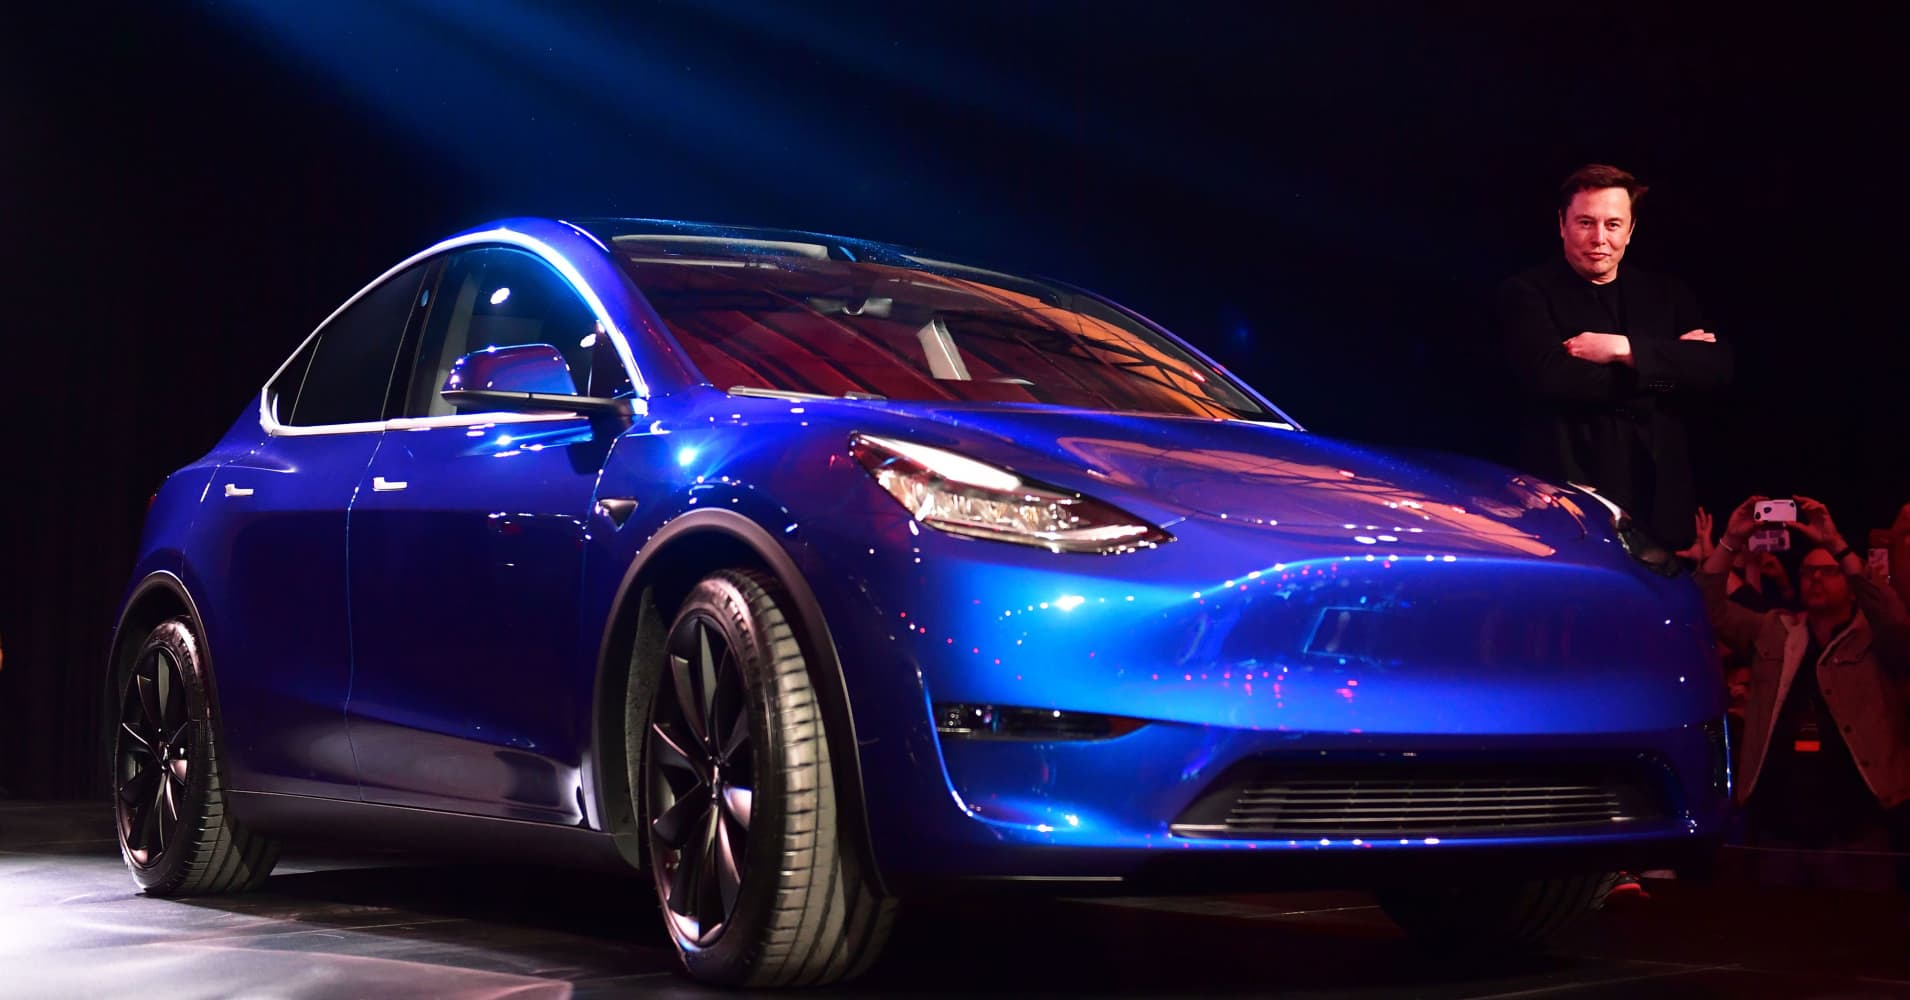 Elon Musk celebrates flawed Tesla Autonomy Day with employee email